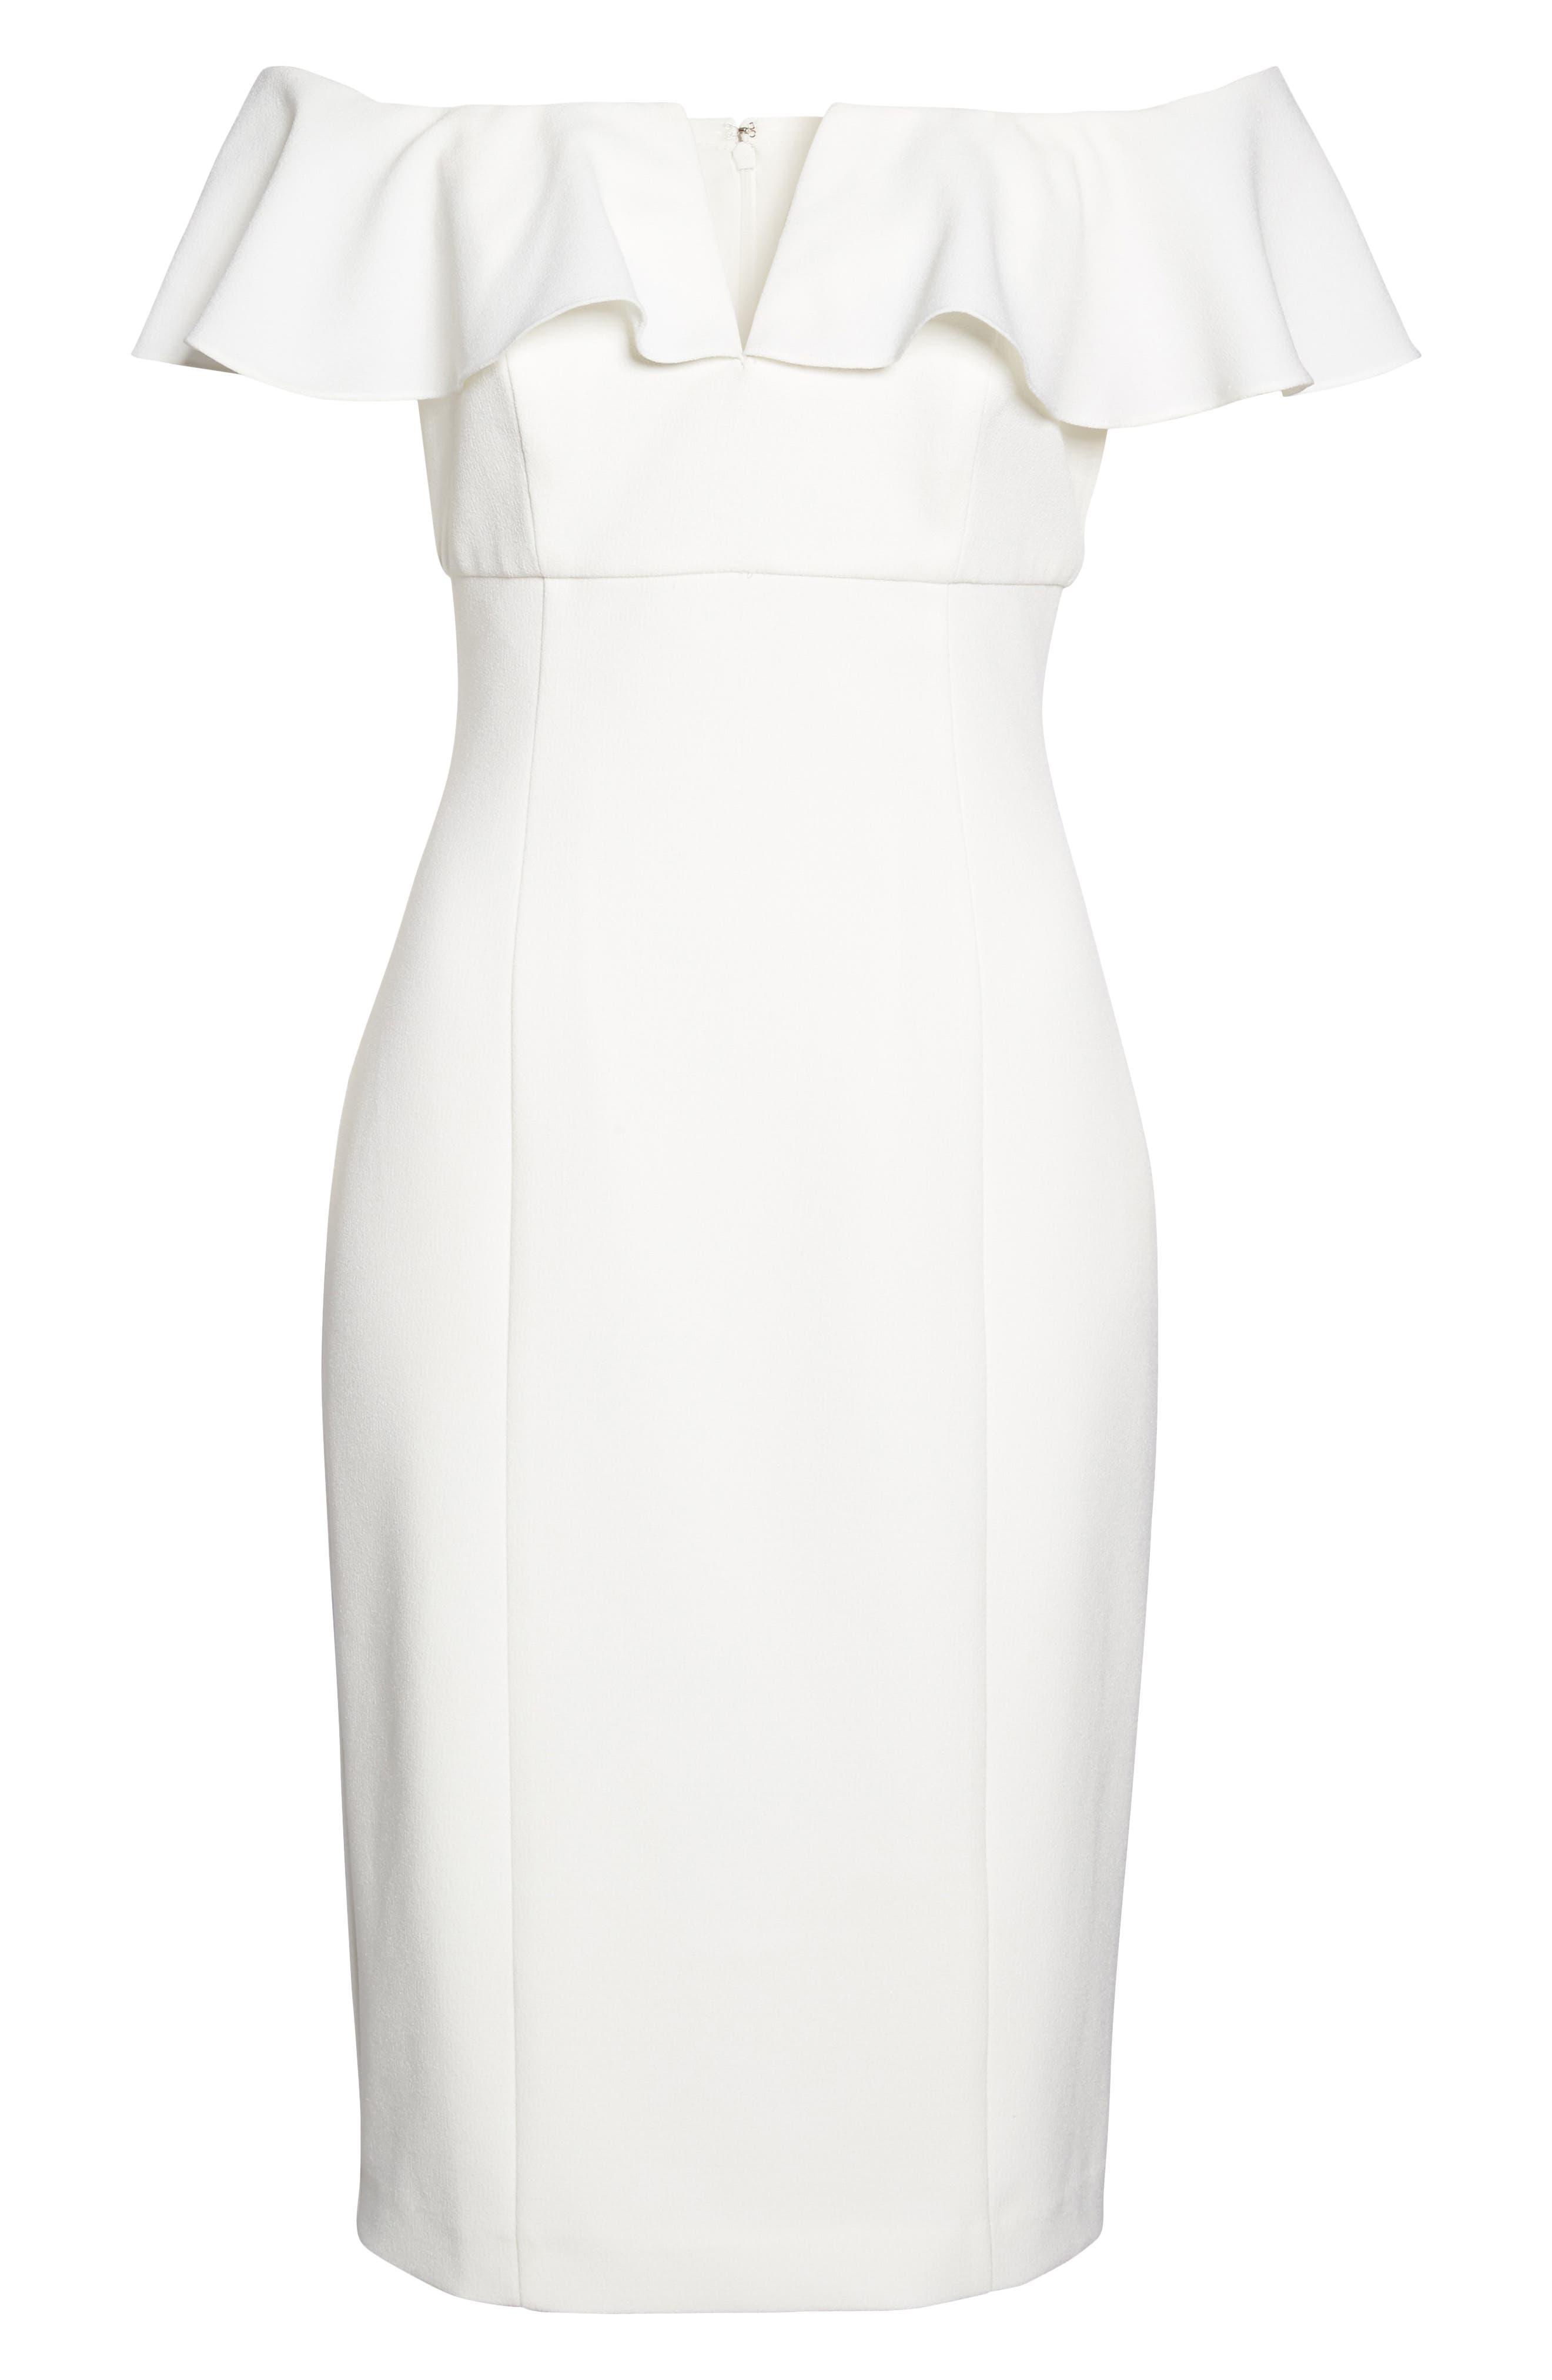 VINCE CAMUTO,                             Off the Shoulder Midi Dress,                             Alternate thumbnail 6, color,                             900